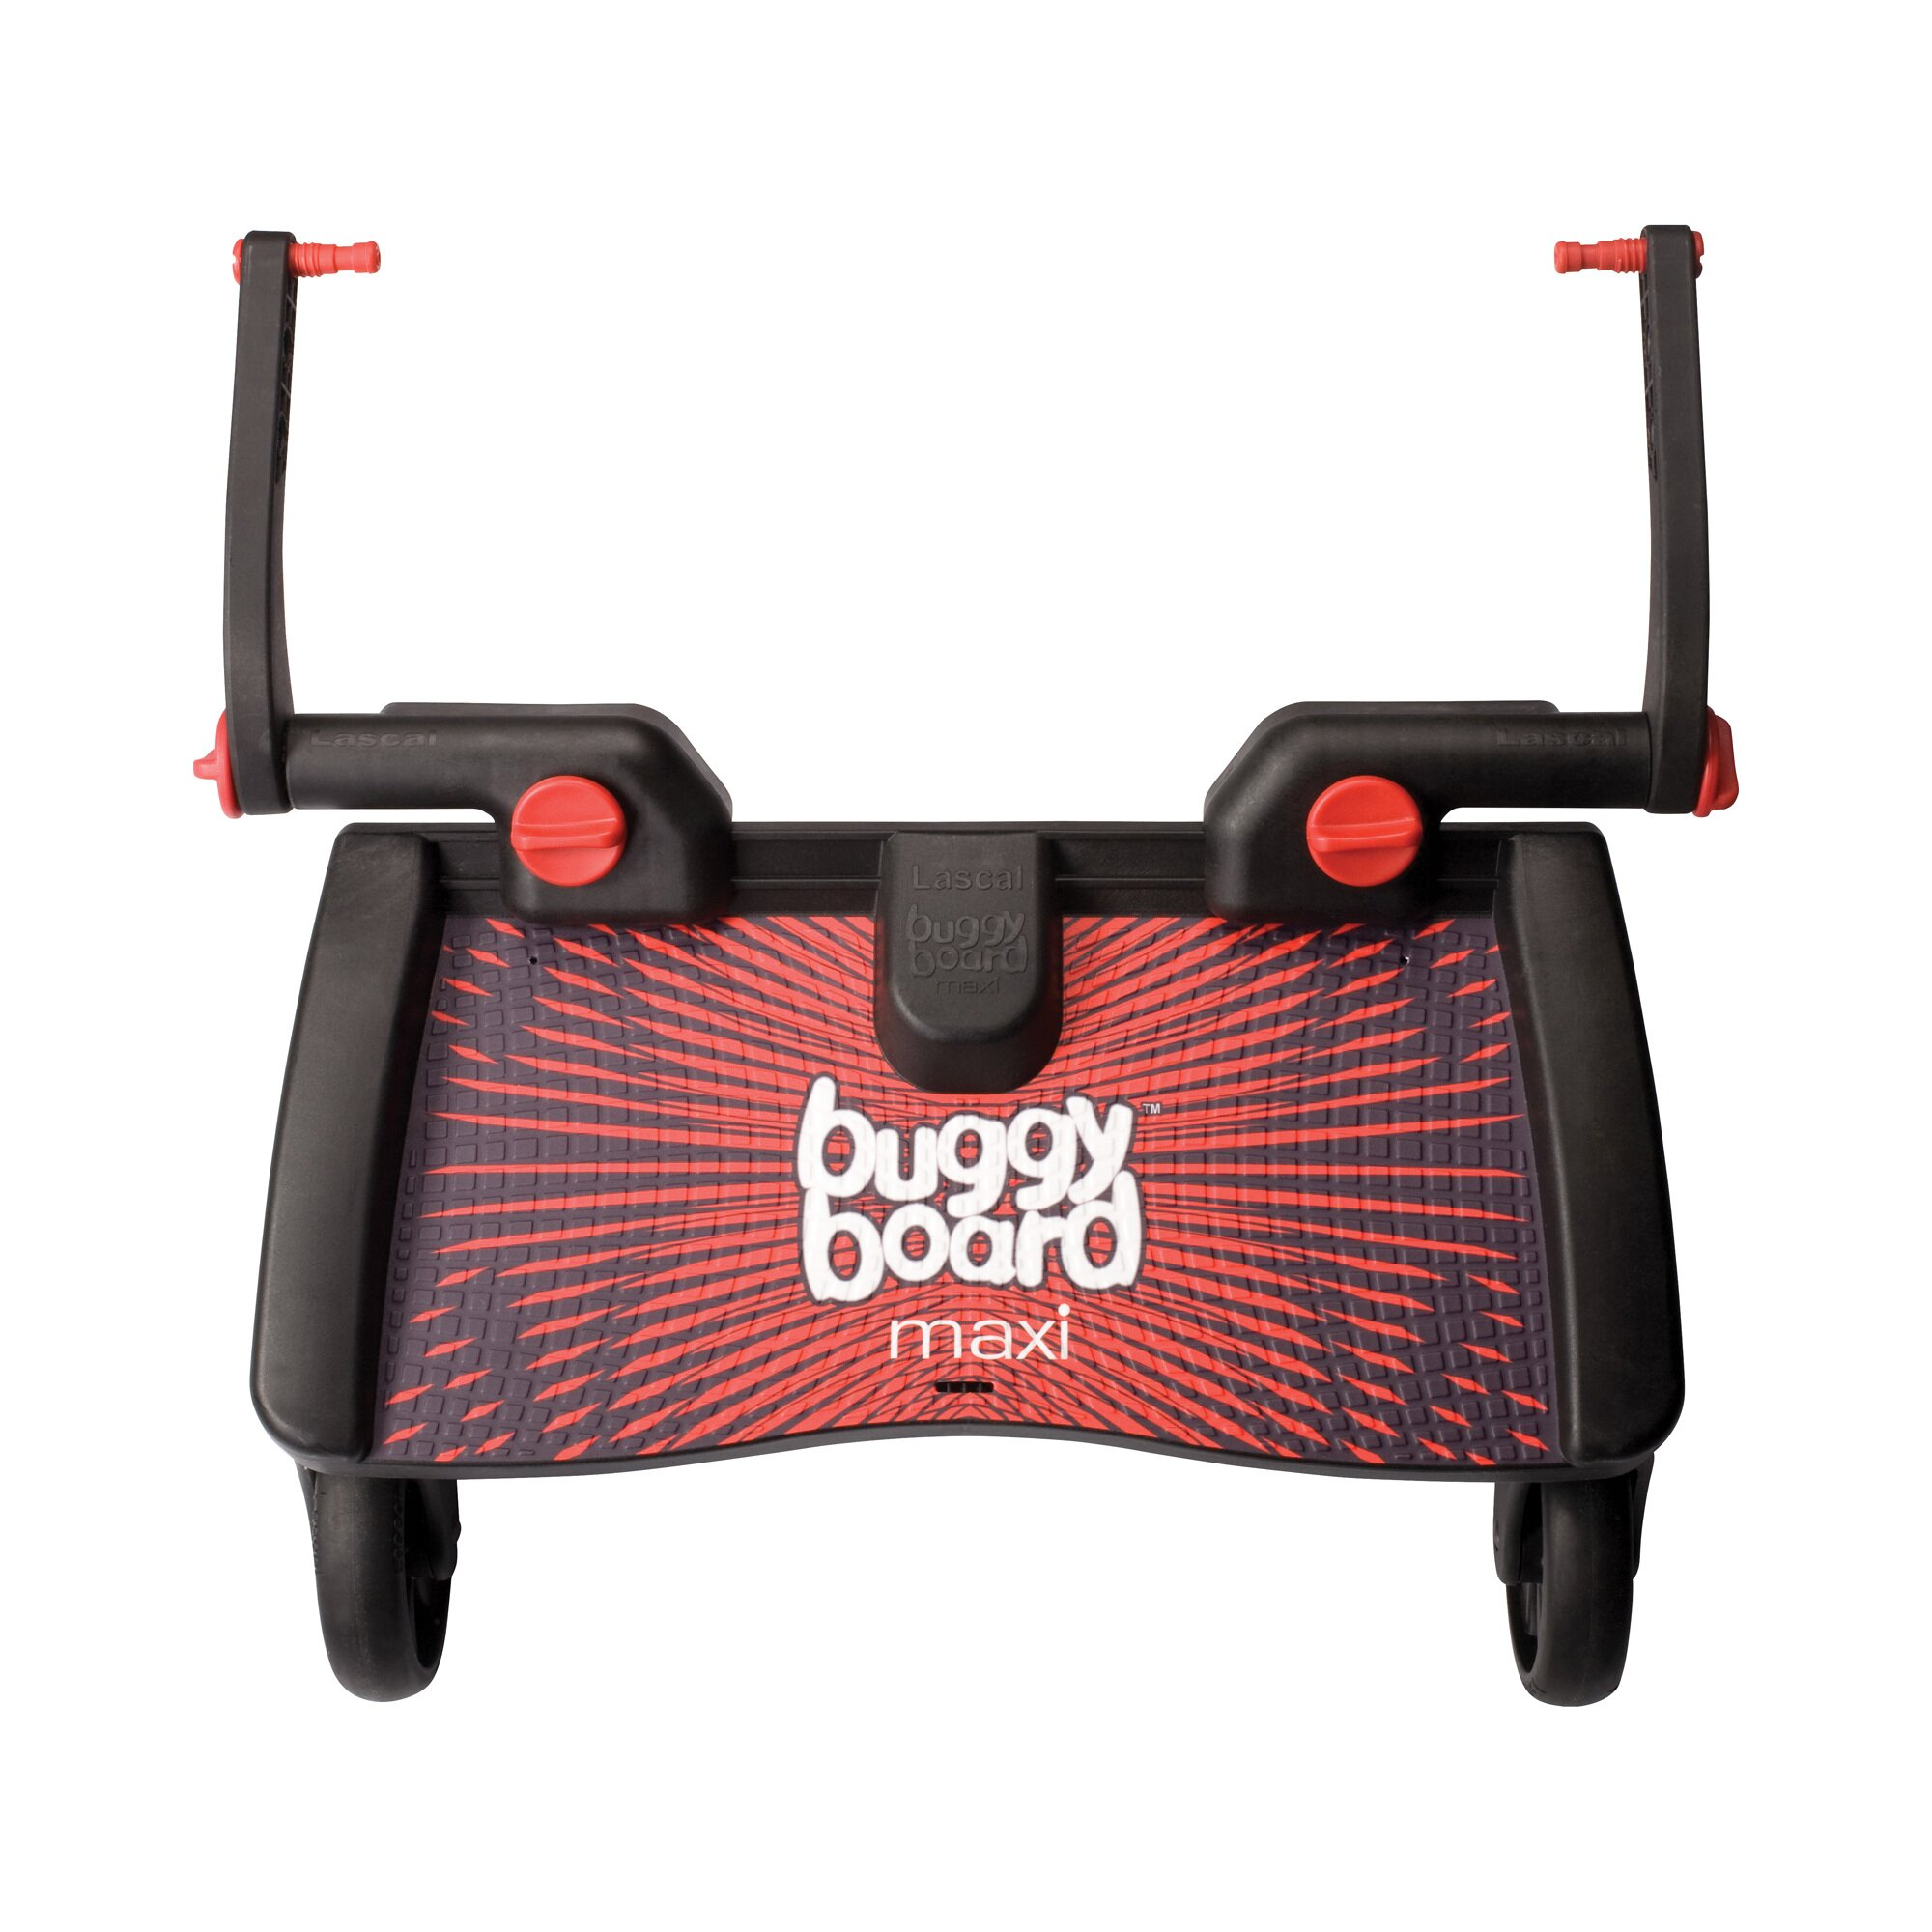 Lascal Buggy-Board Maxi für Kinderwagen, Kinderwagen Jogger, Buggy rot